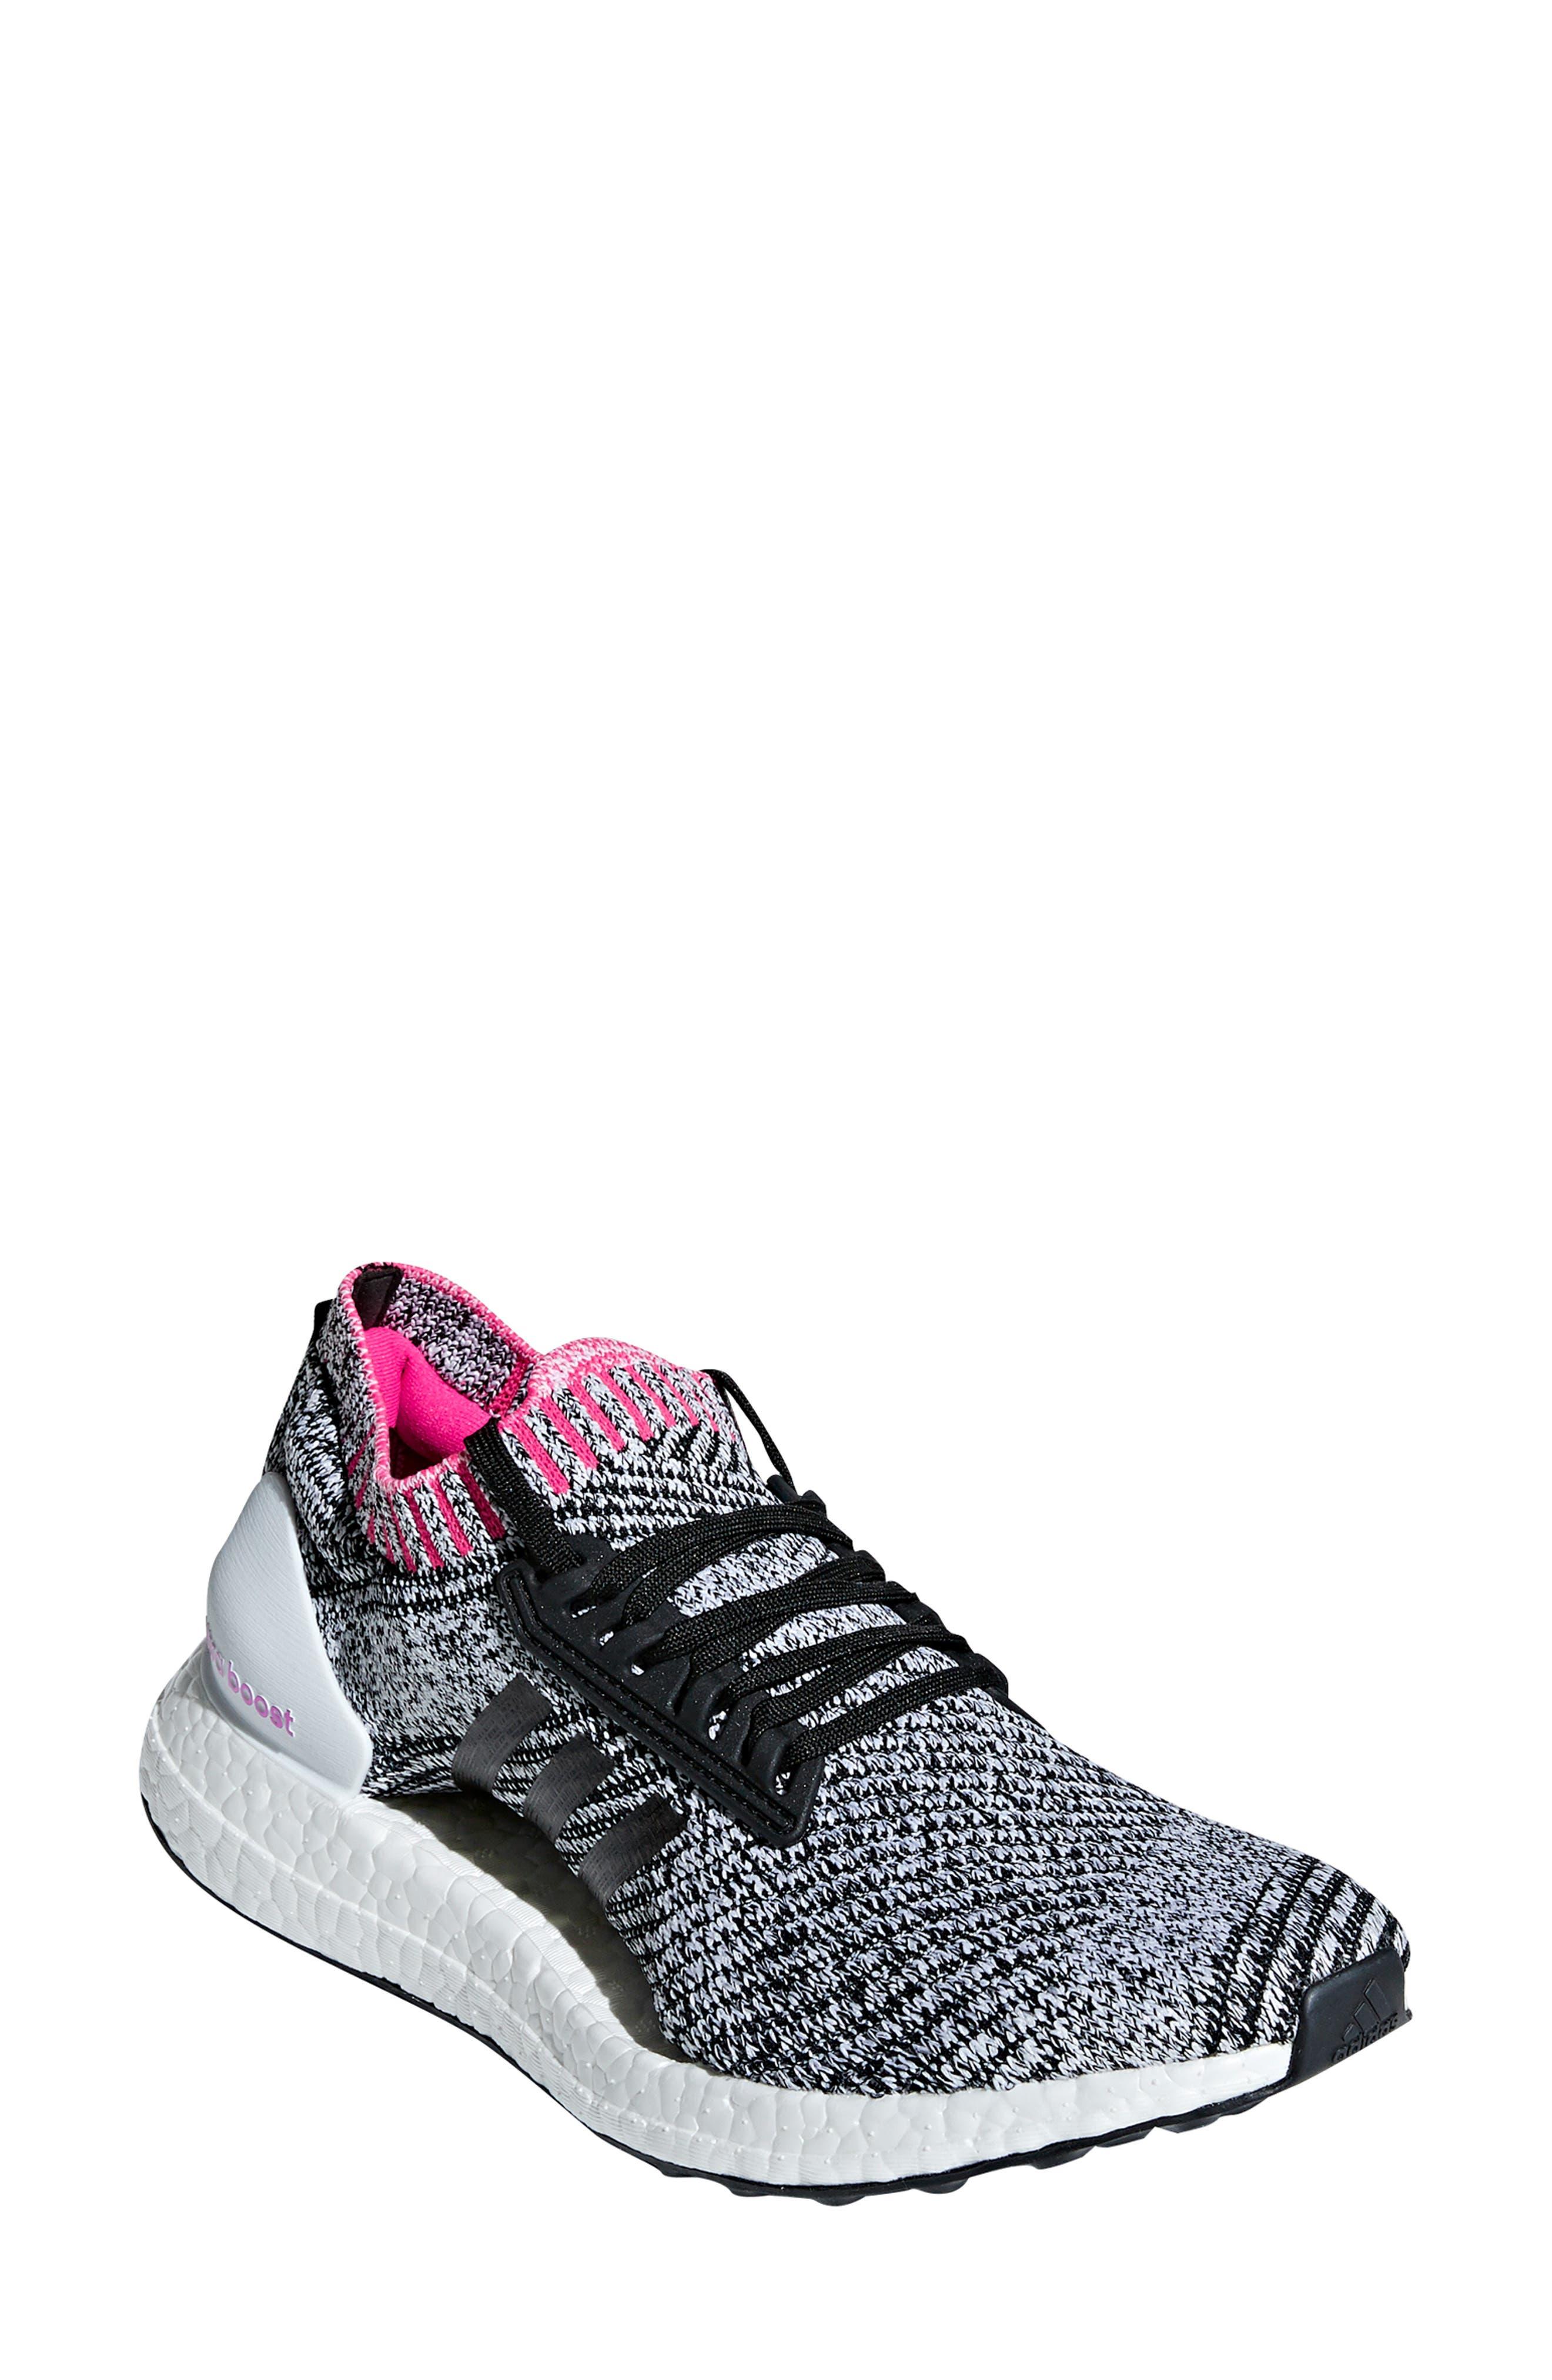 Adidas Ultraboost X Running Shoe, Black